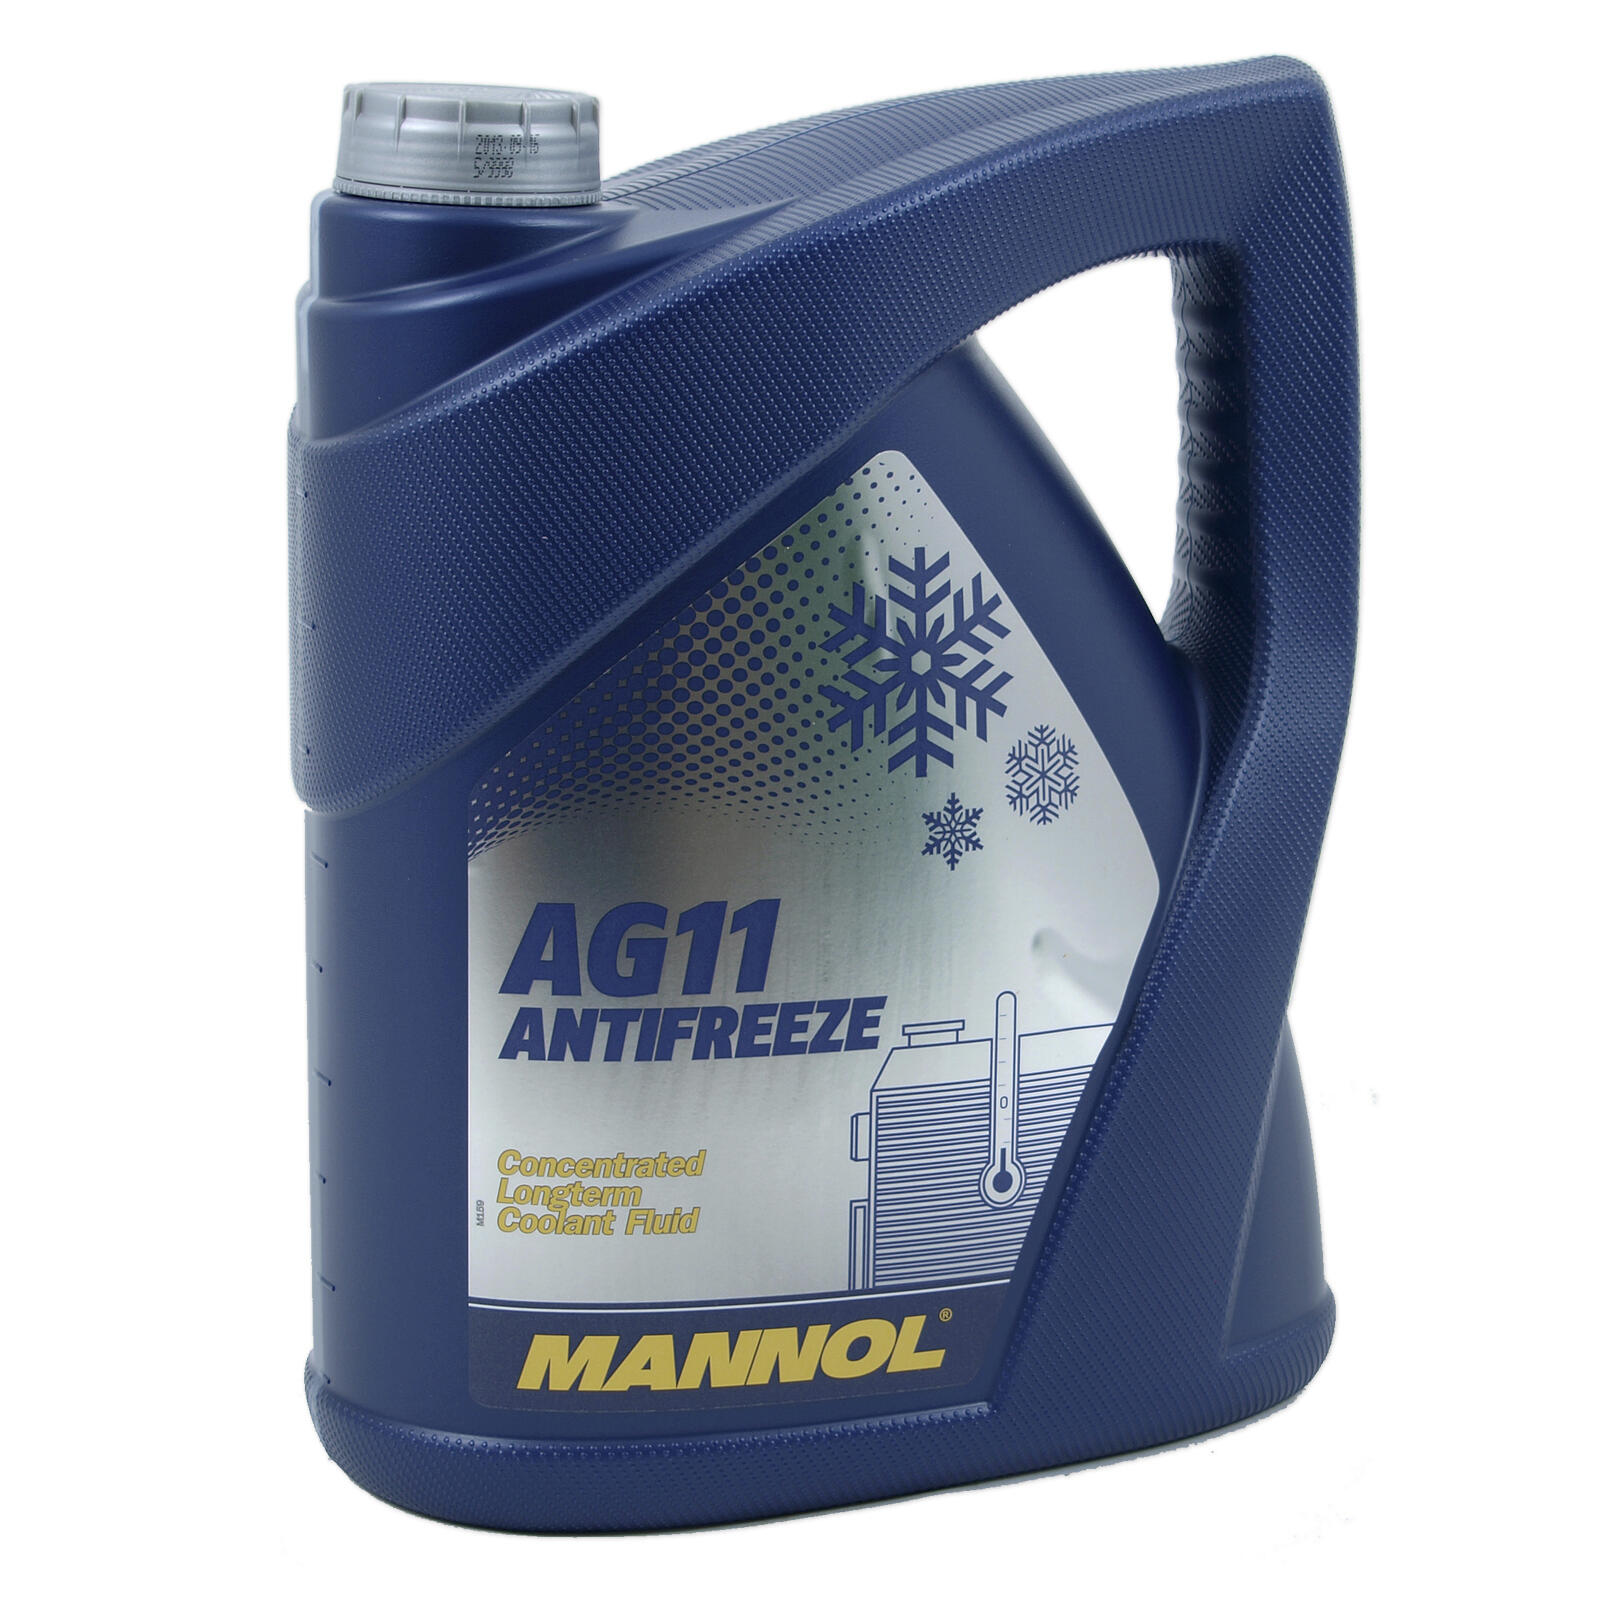 MANNOL Kühlerfrostschutz Kühlmittel Longterm Antifreeze AG 11 Konzentrat 5 Liter